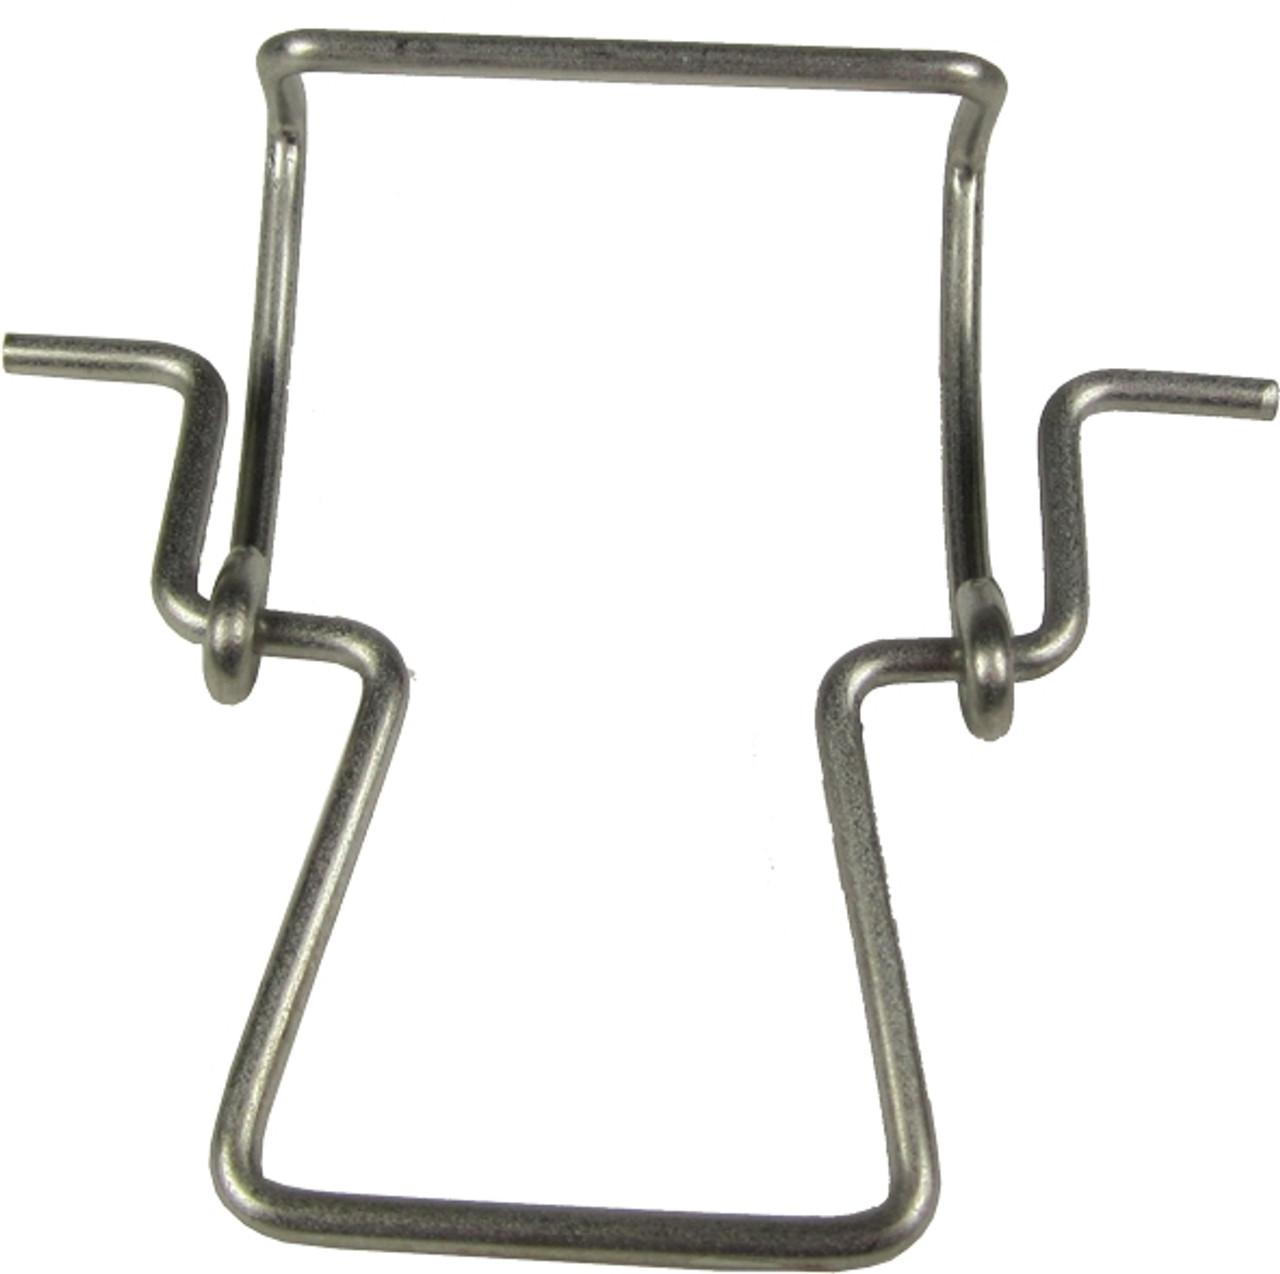 Ezgo Parts And Accessories Rectangular Wire Latch